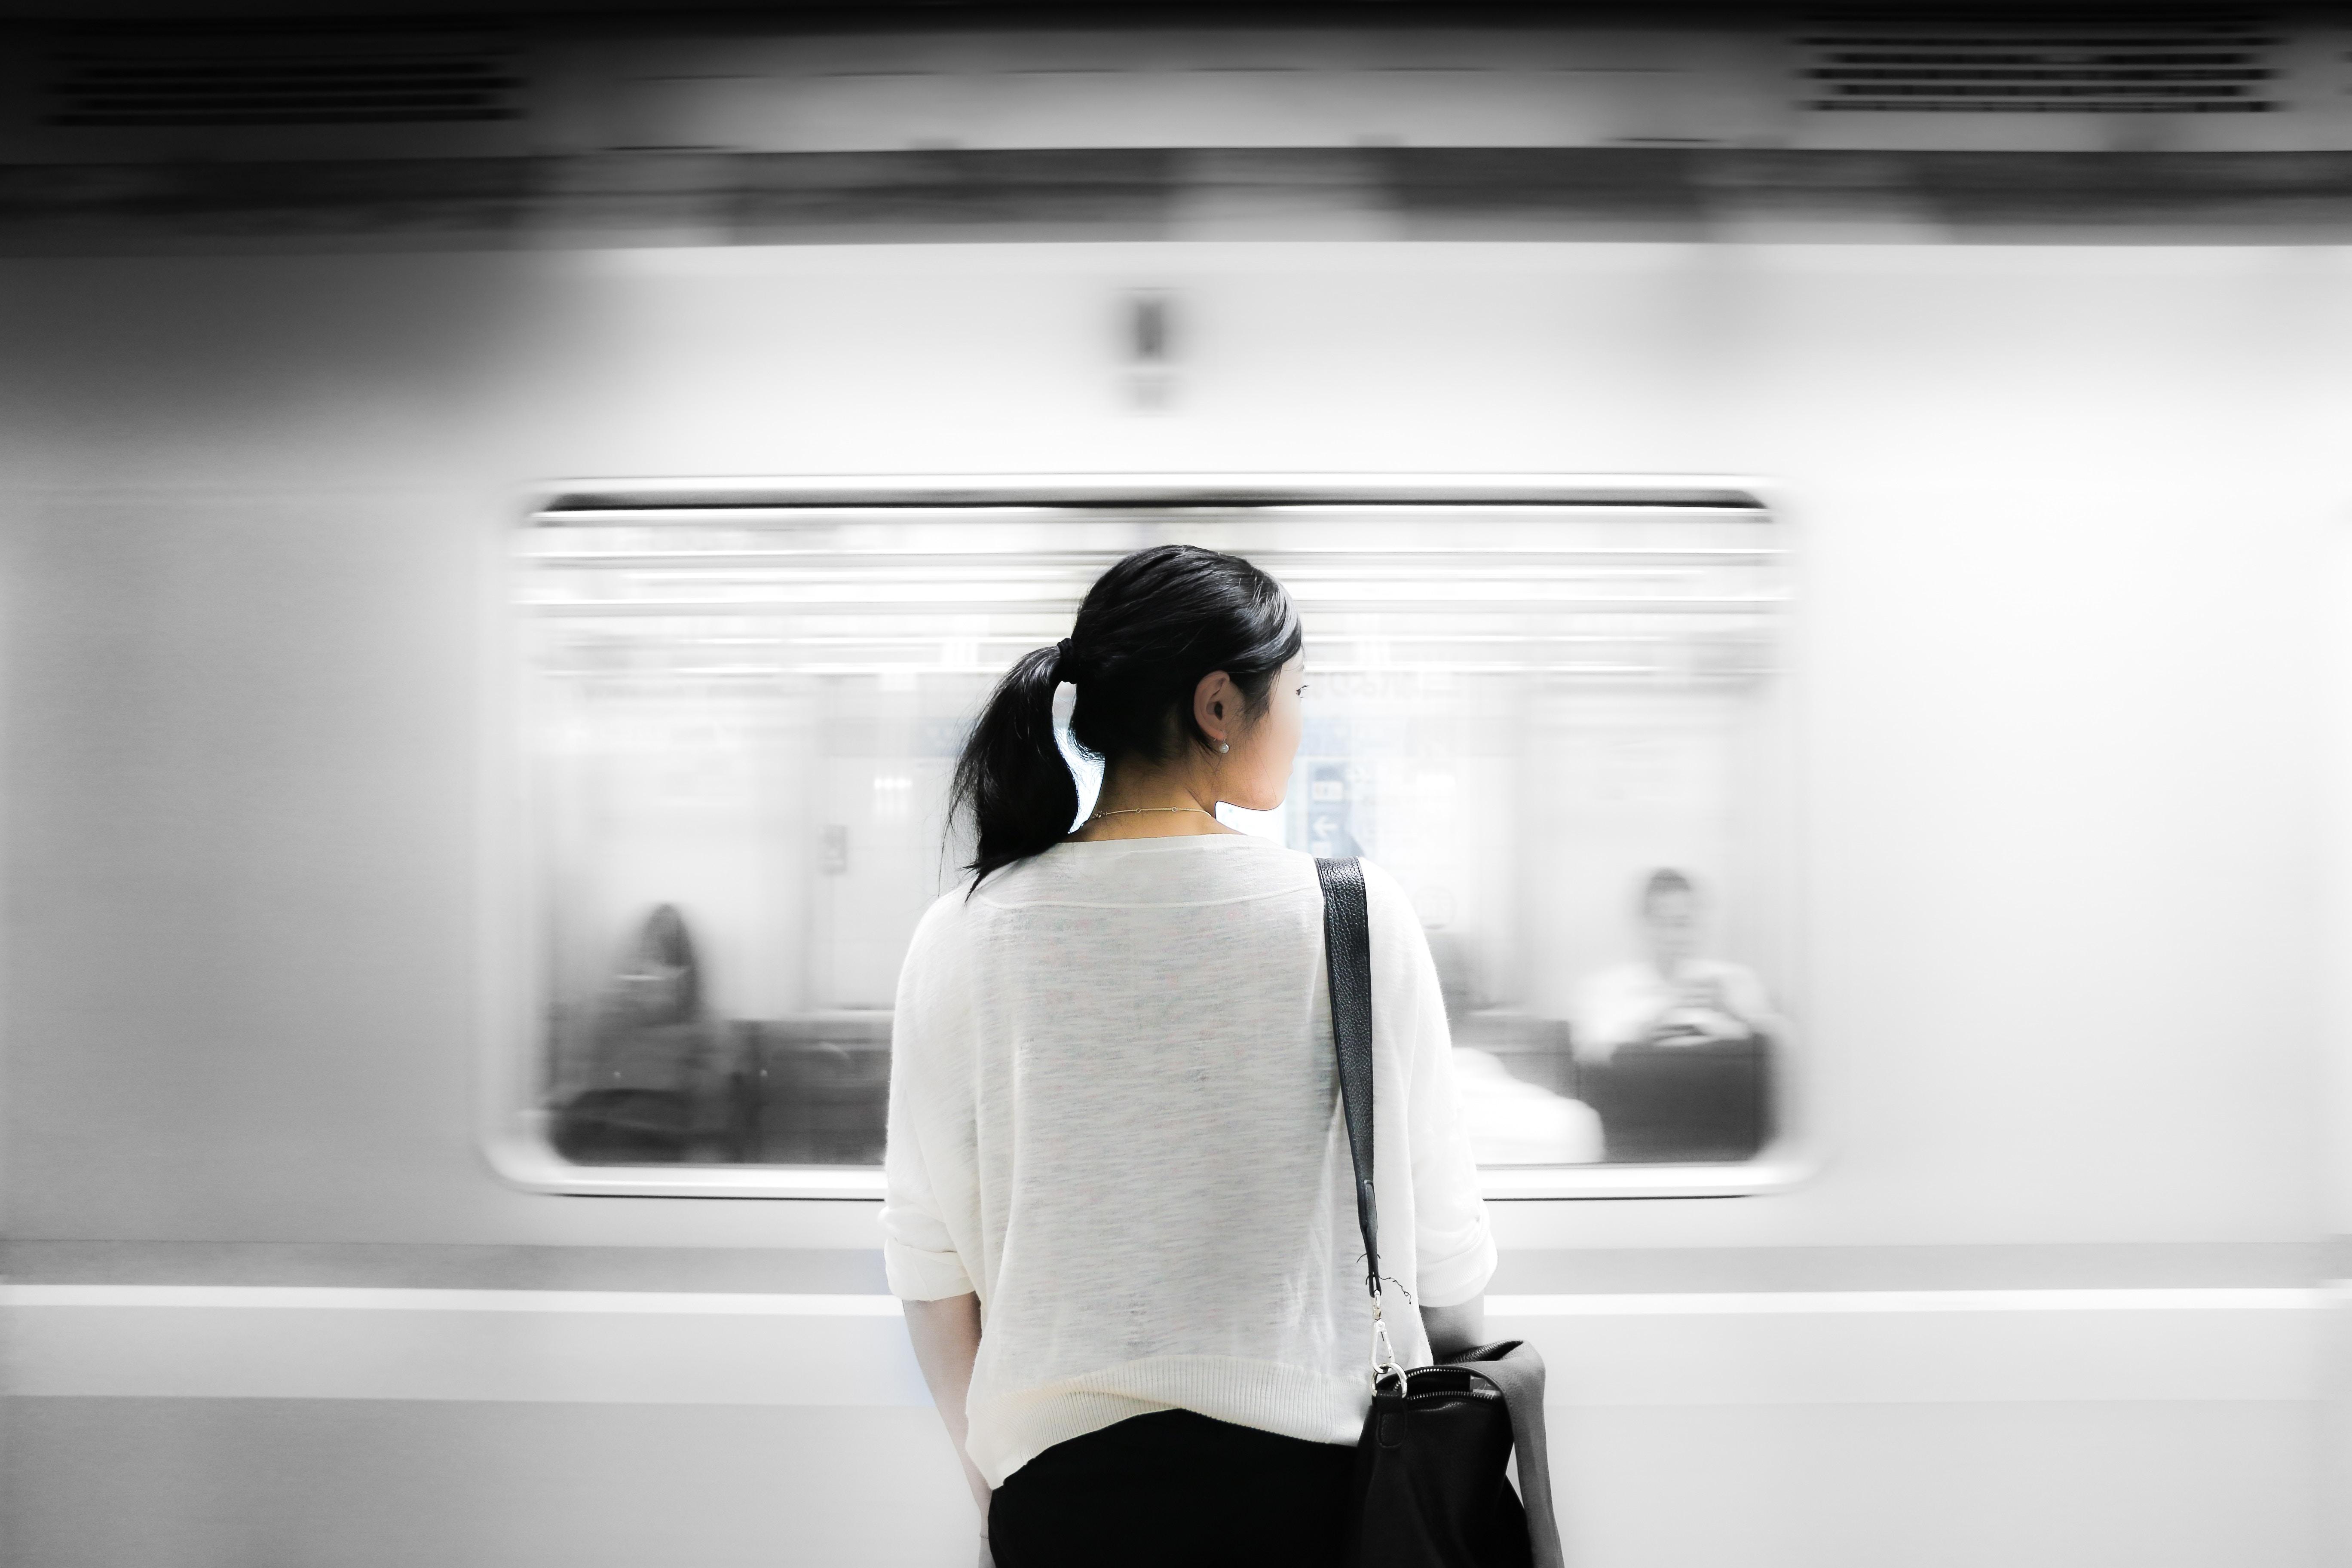 Image of a woman at the subway station